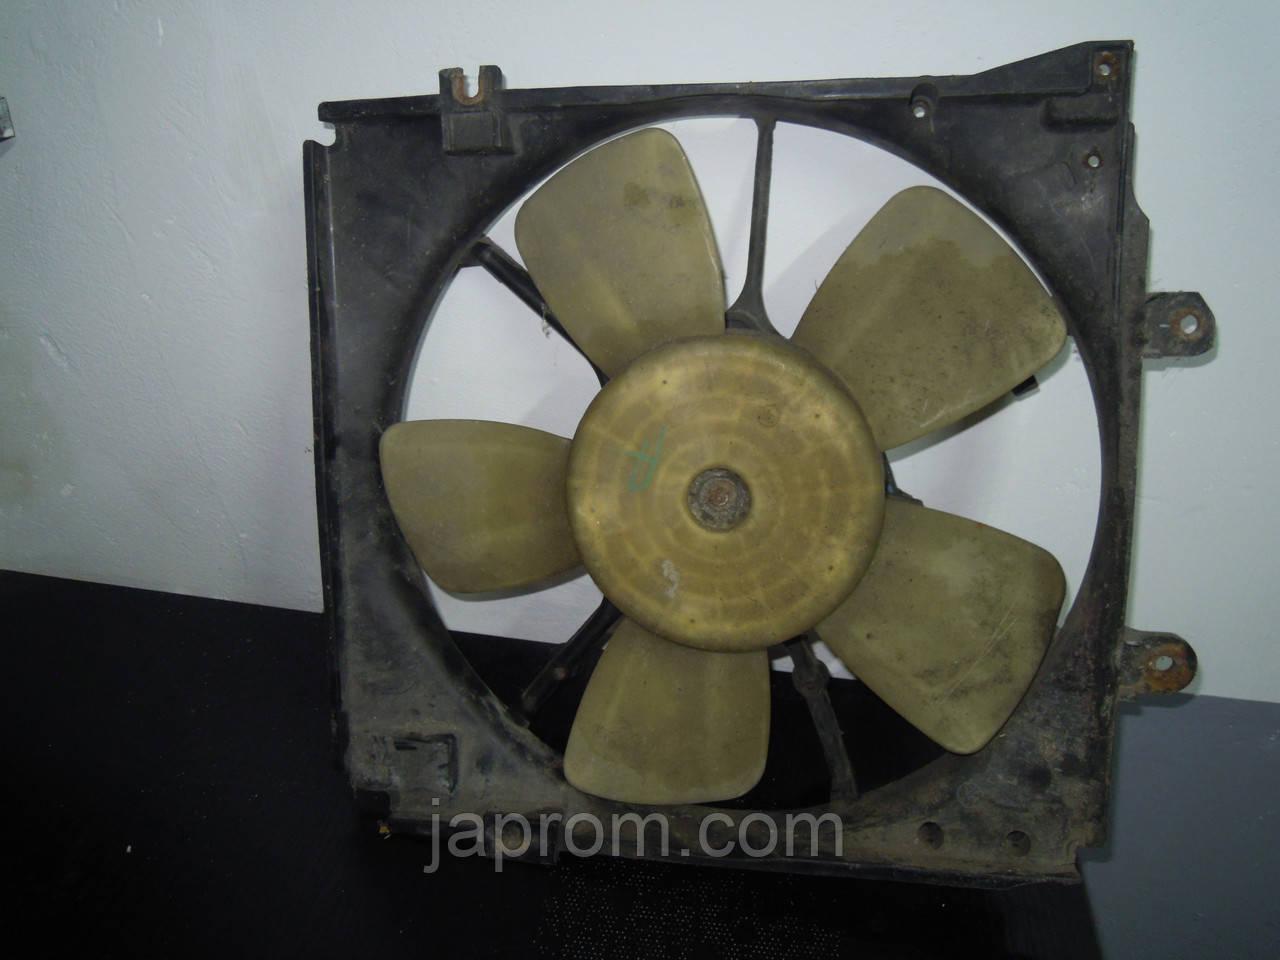 Вентилятор (диффузор) радиатора Mazda 626 GE MX-6 1992-1997г.в. 1.8+2.0+2.5 бензин